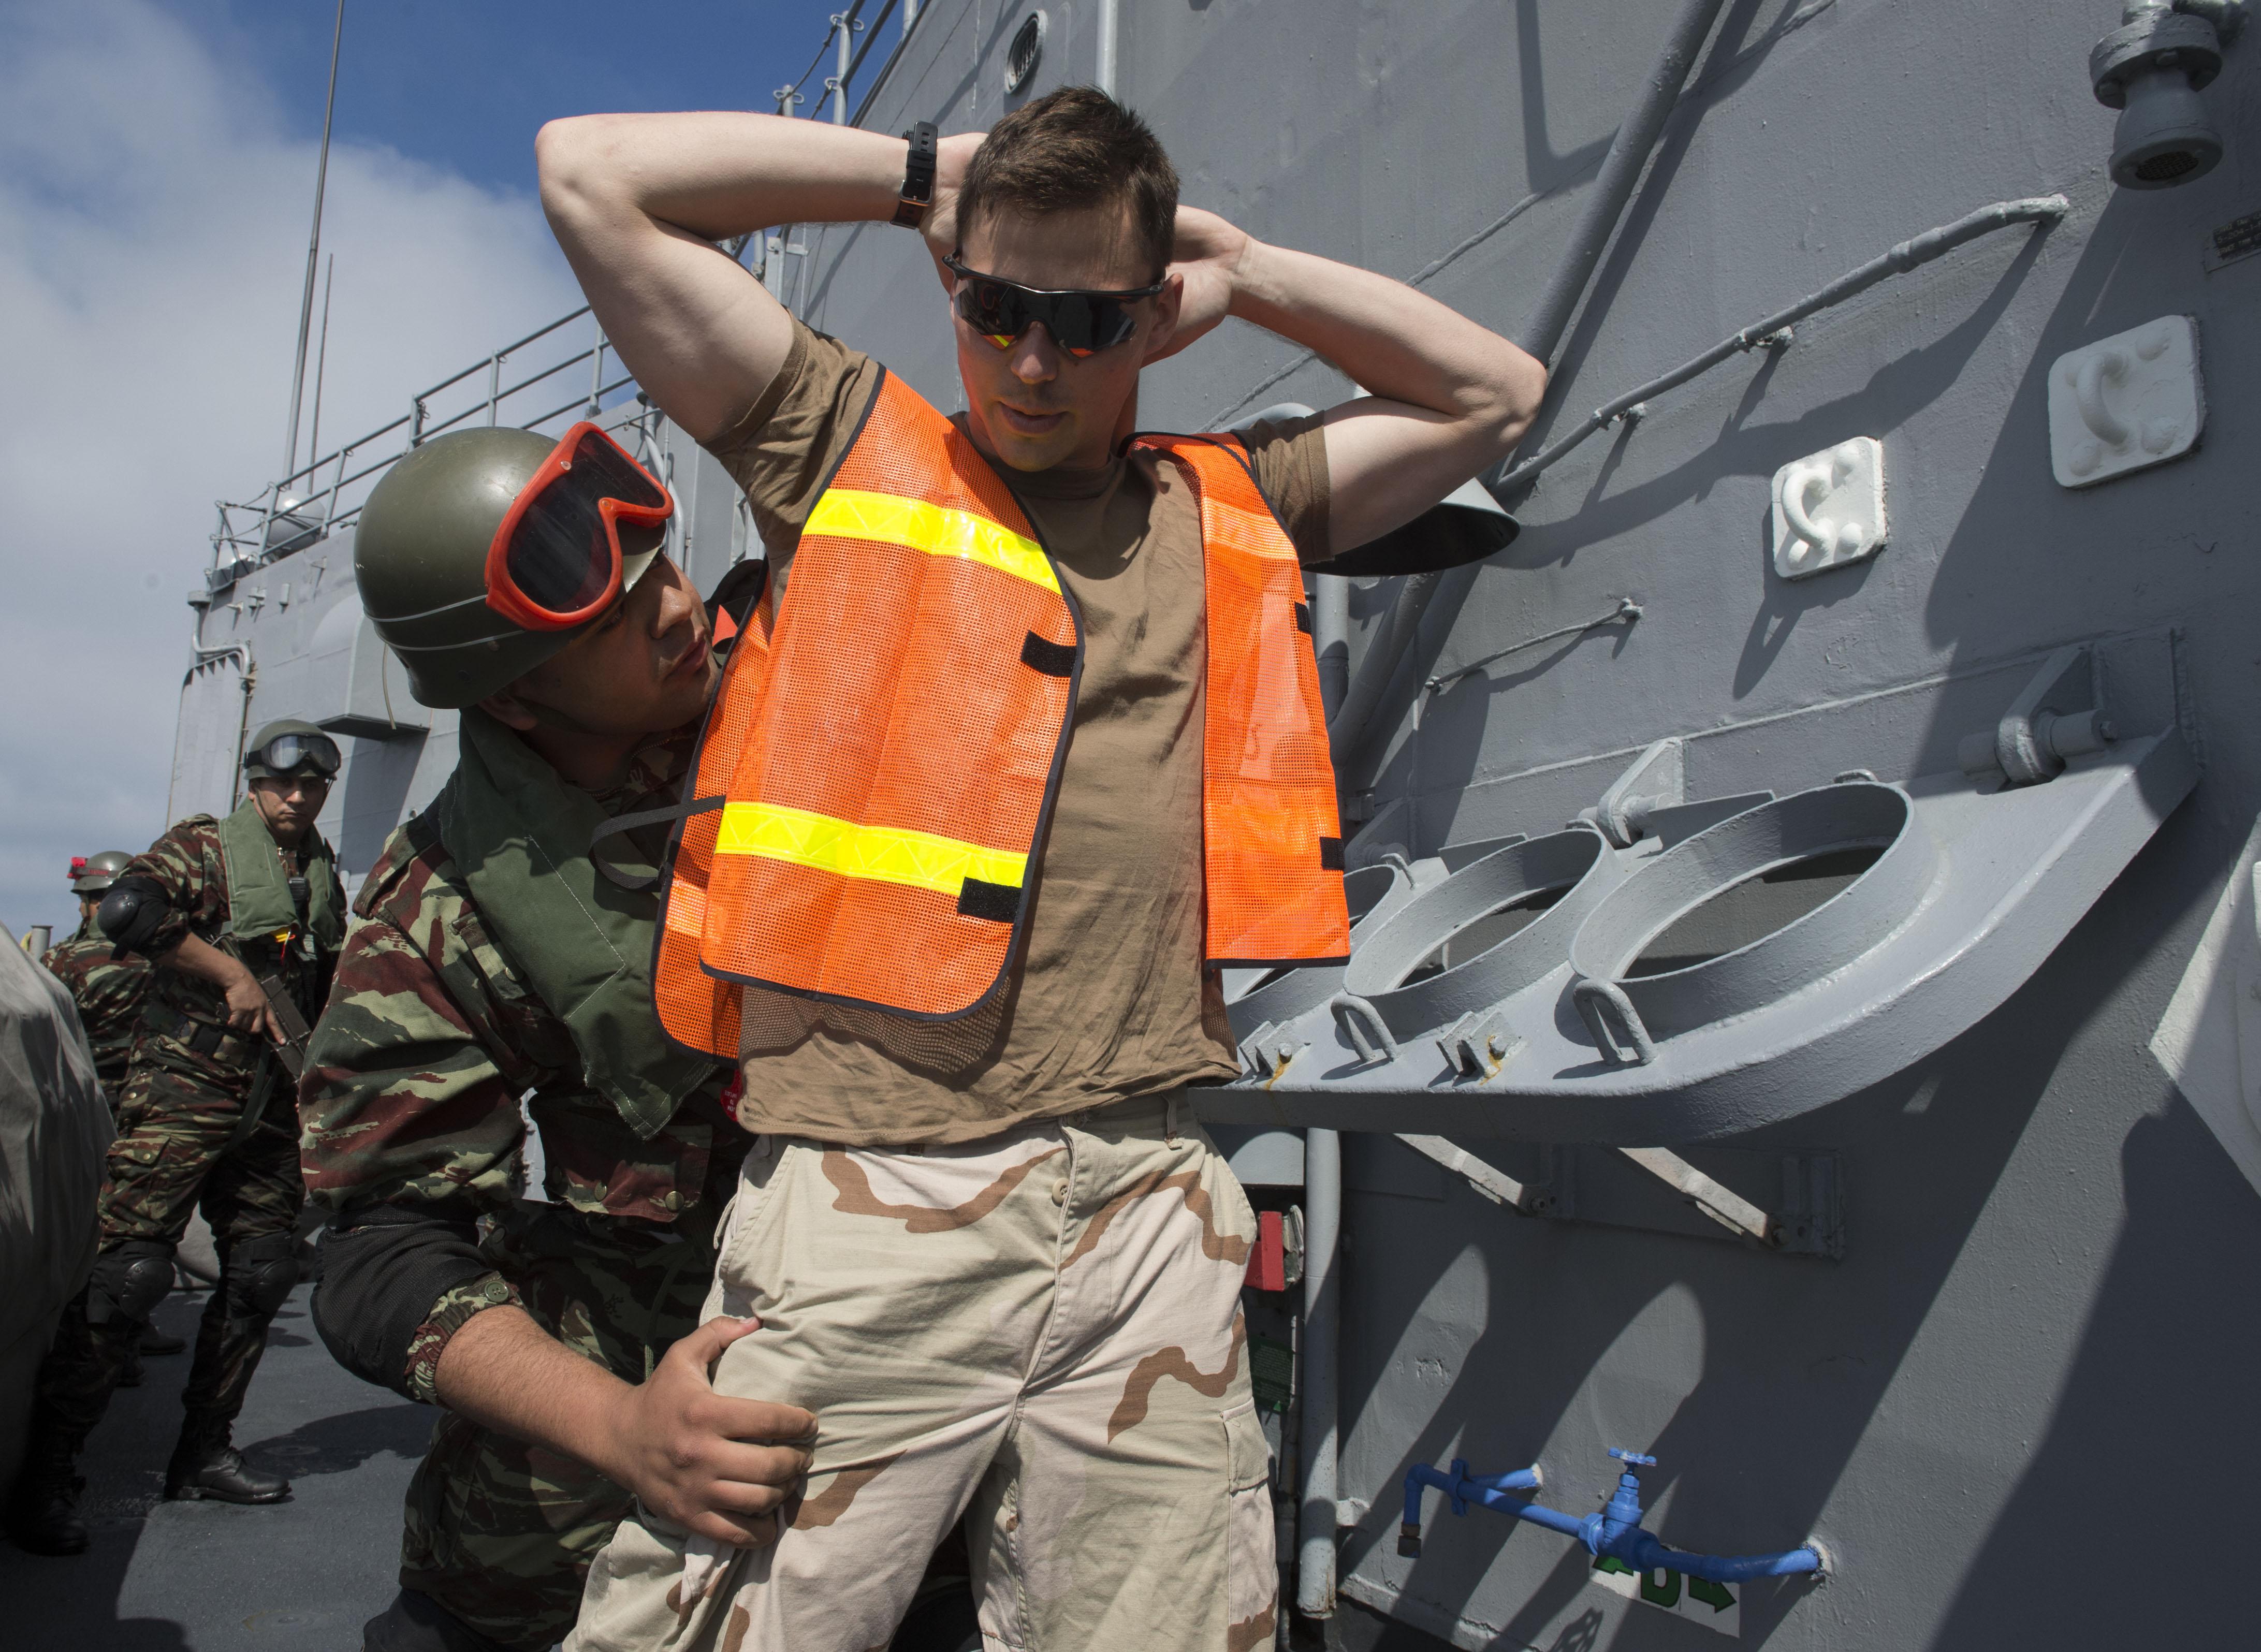 PASSEX 2014-3 : USS Simpson ( FFG56 ) et RMN Hassan II ( 612 ) 12990425044_a2ebe4dd98_o